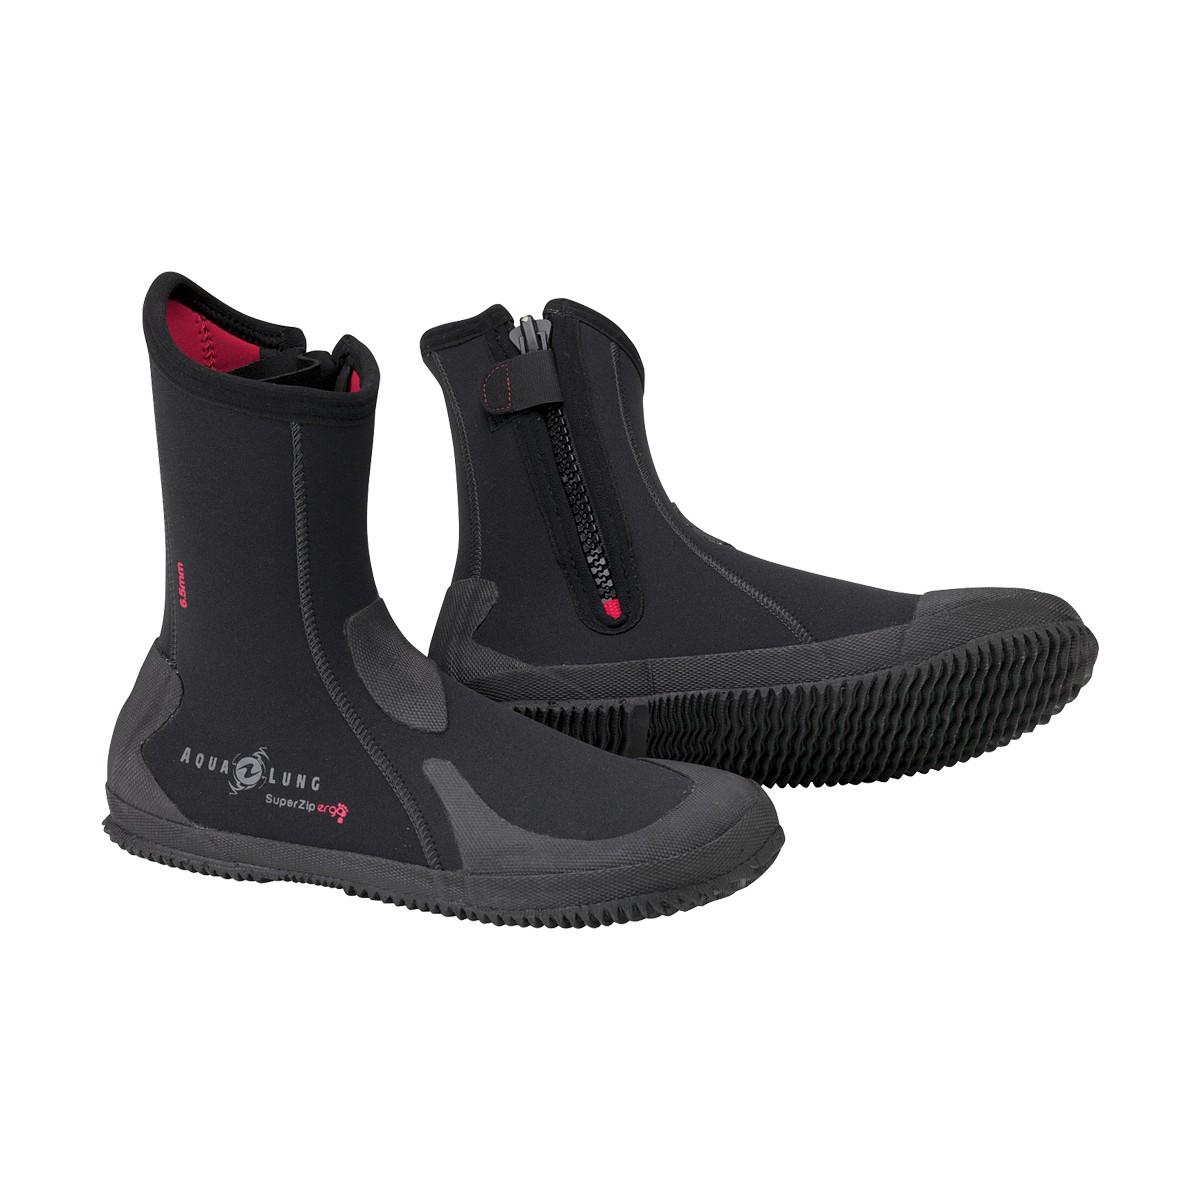 Aqua Lung Men's 6.5mm Superzip Ergo Boot